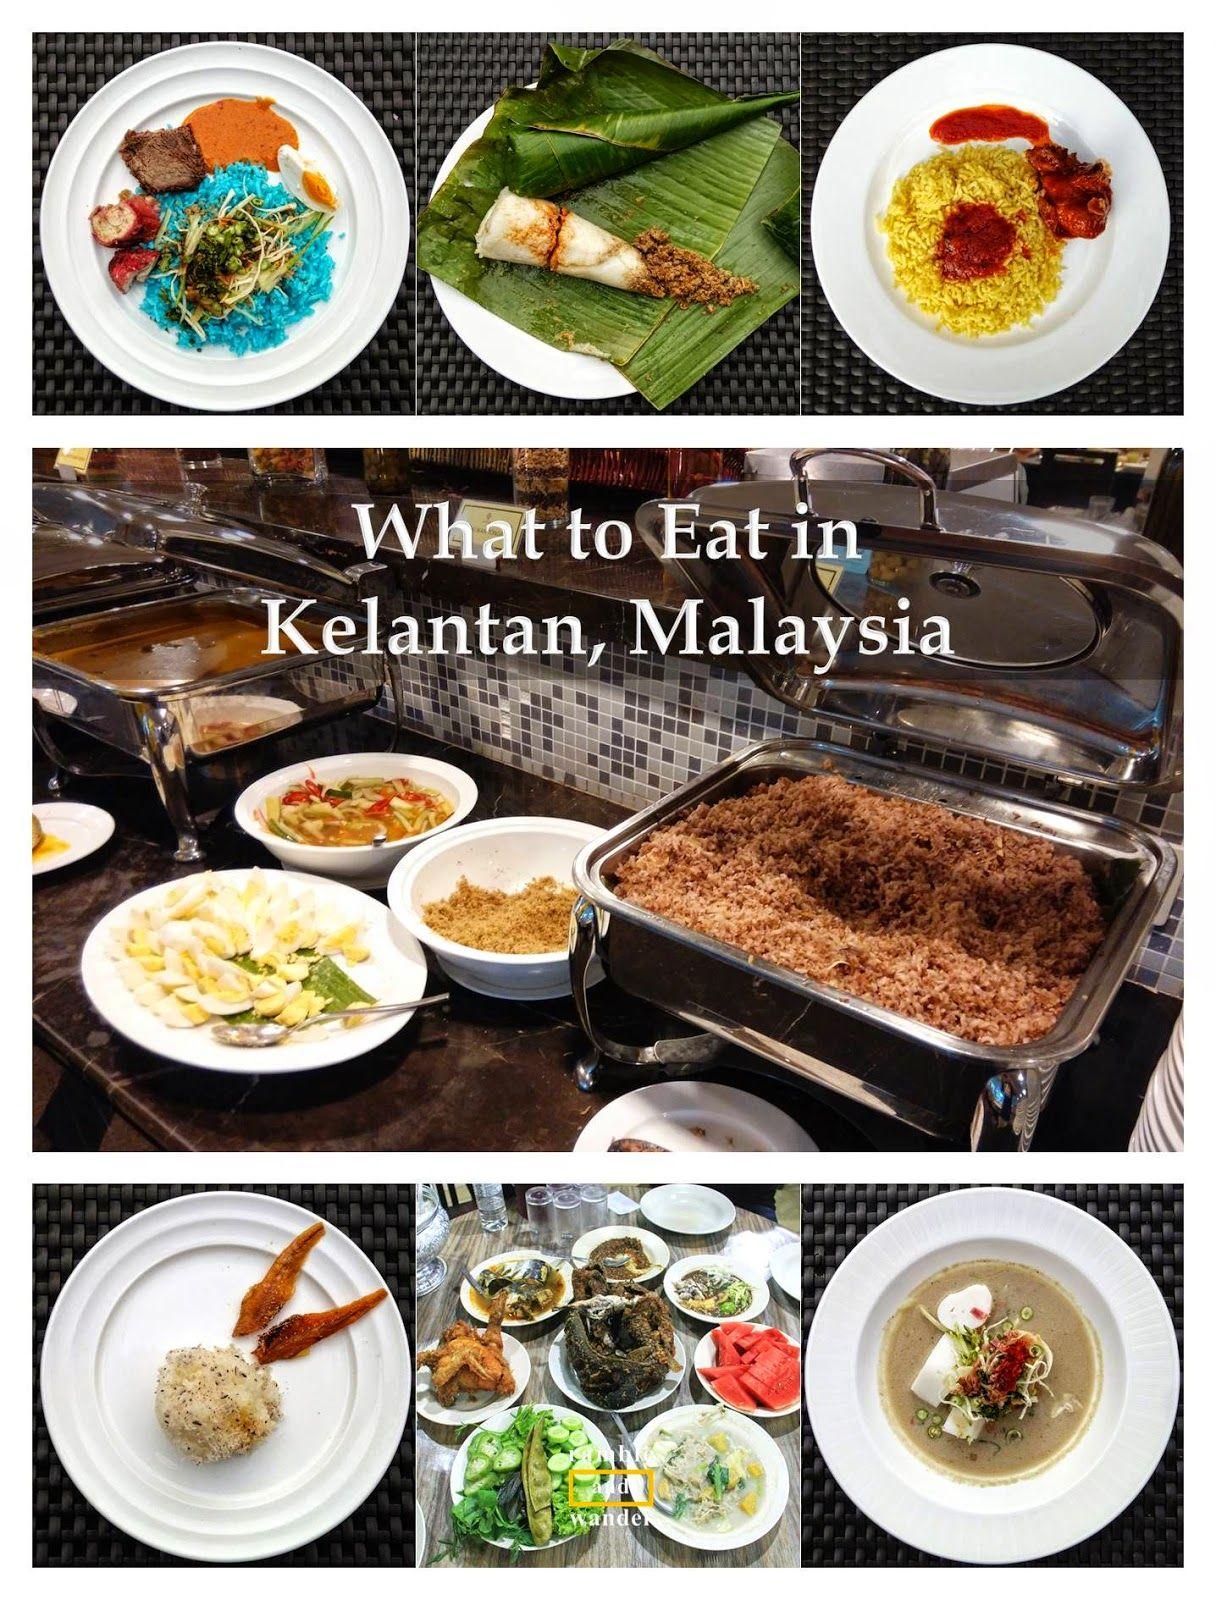 Malaysia Top Things To Do And See In Kota Bharu What To Eat Kota Bharu Travel Food Eat